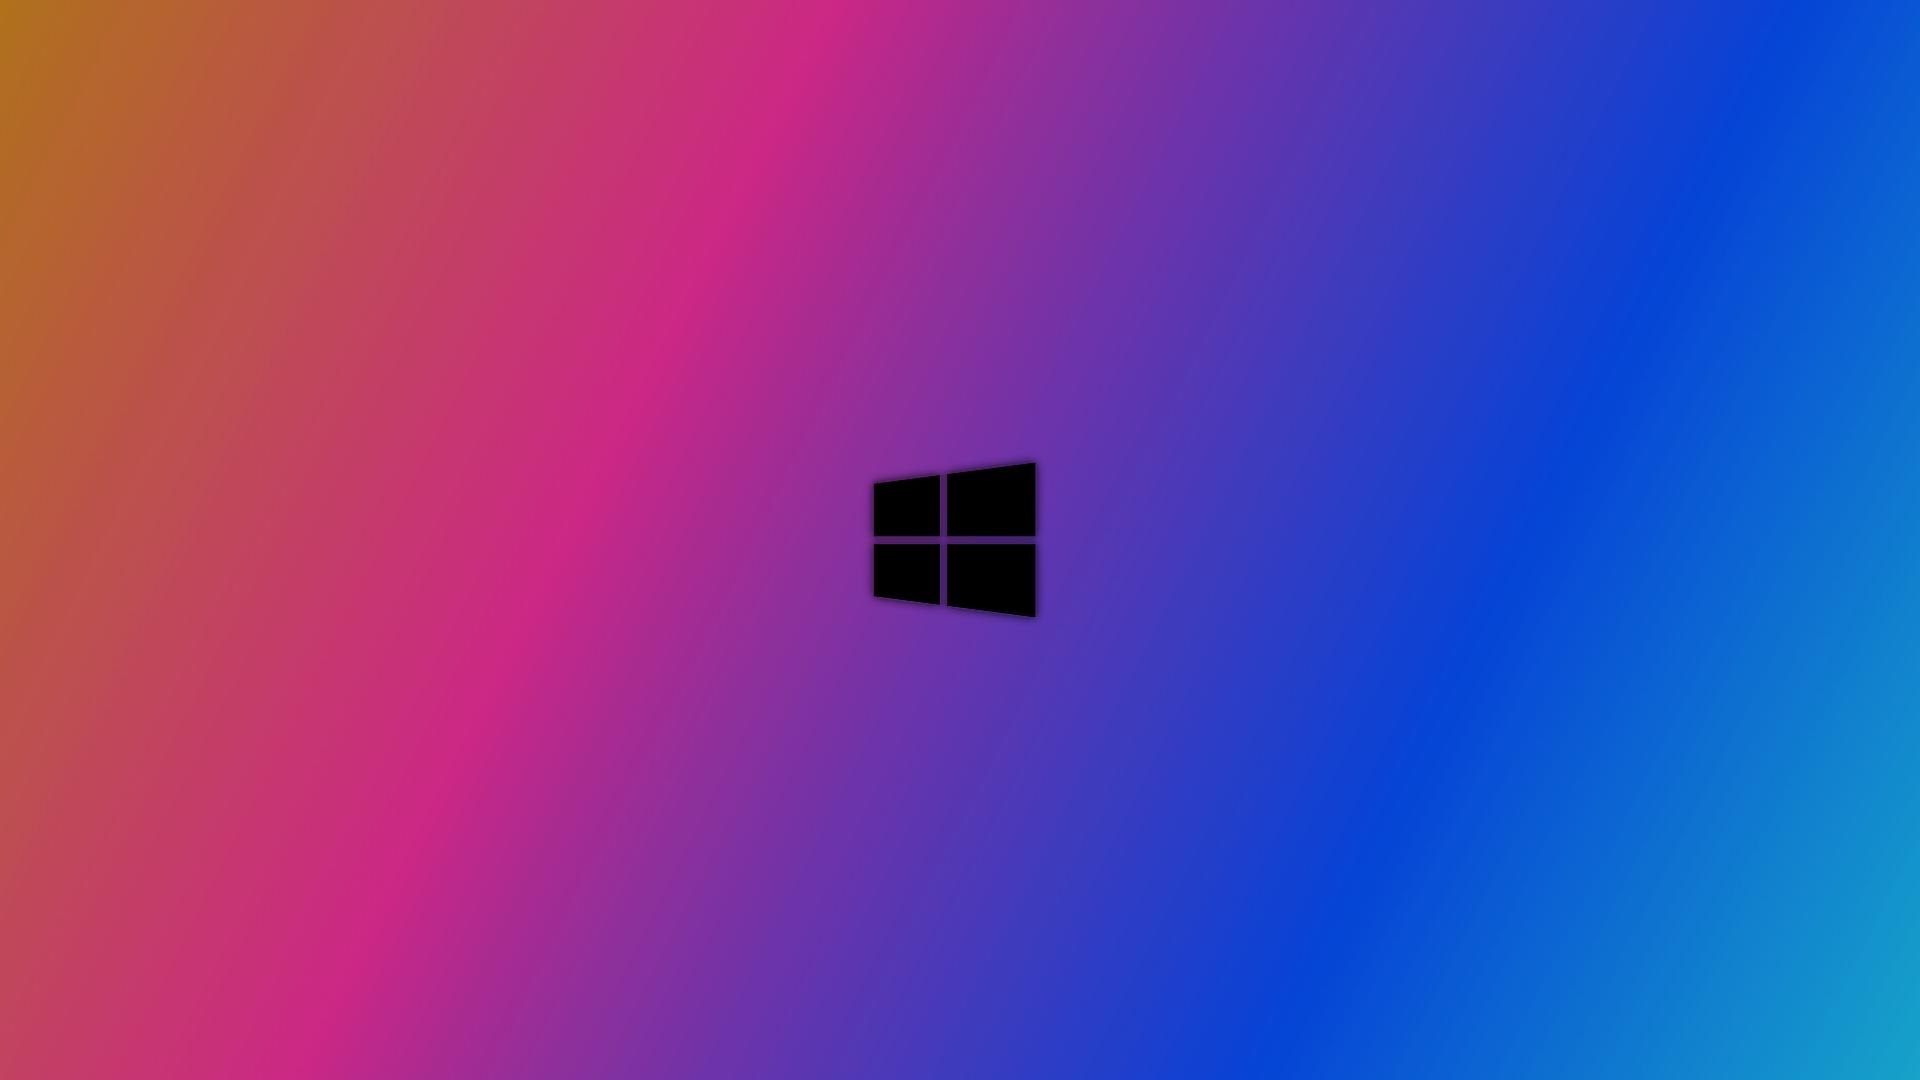 Wallpaper Windows 10 Blurred Designer Colorful